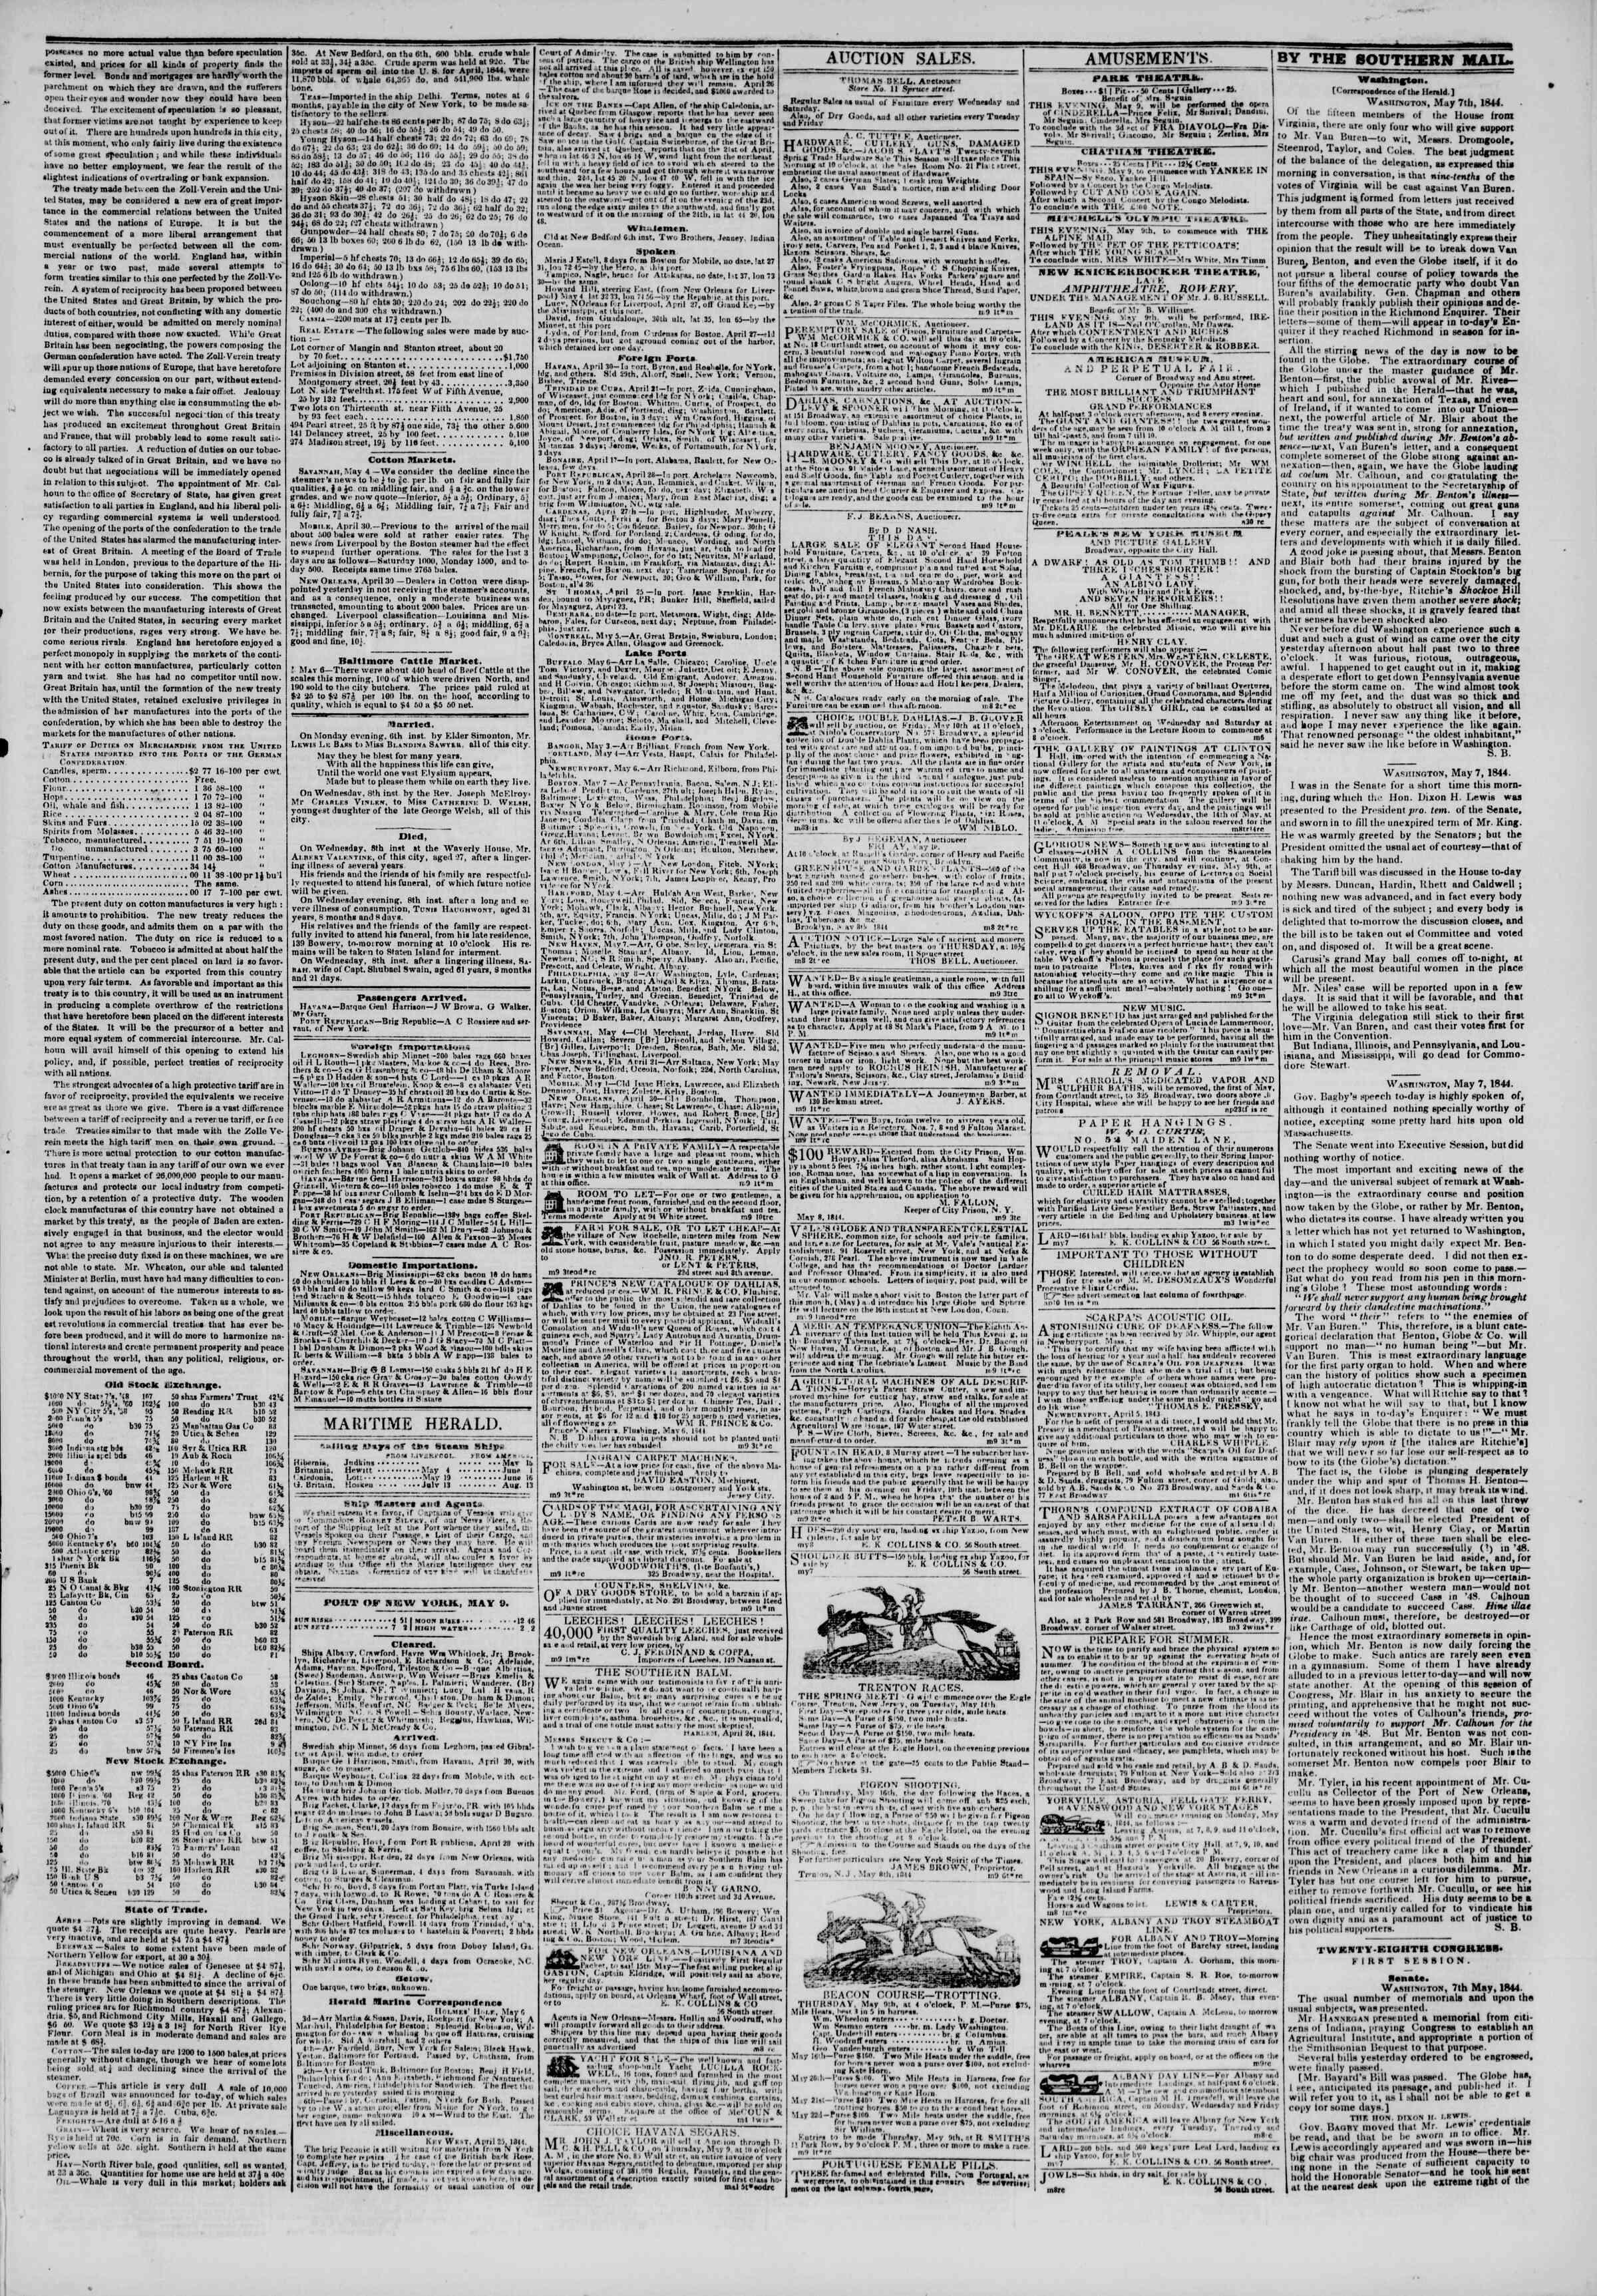 May 9, 1844 Tarihli The New York Herald Gazetesi Sayfa 3